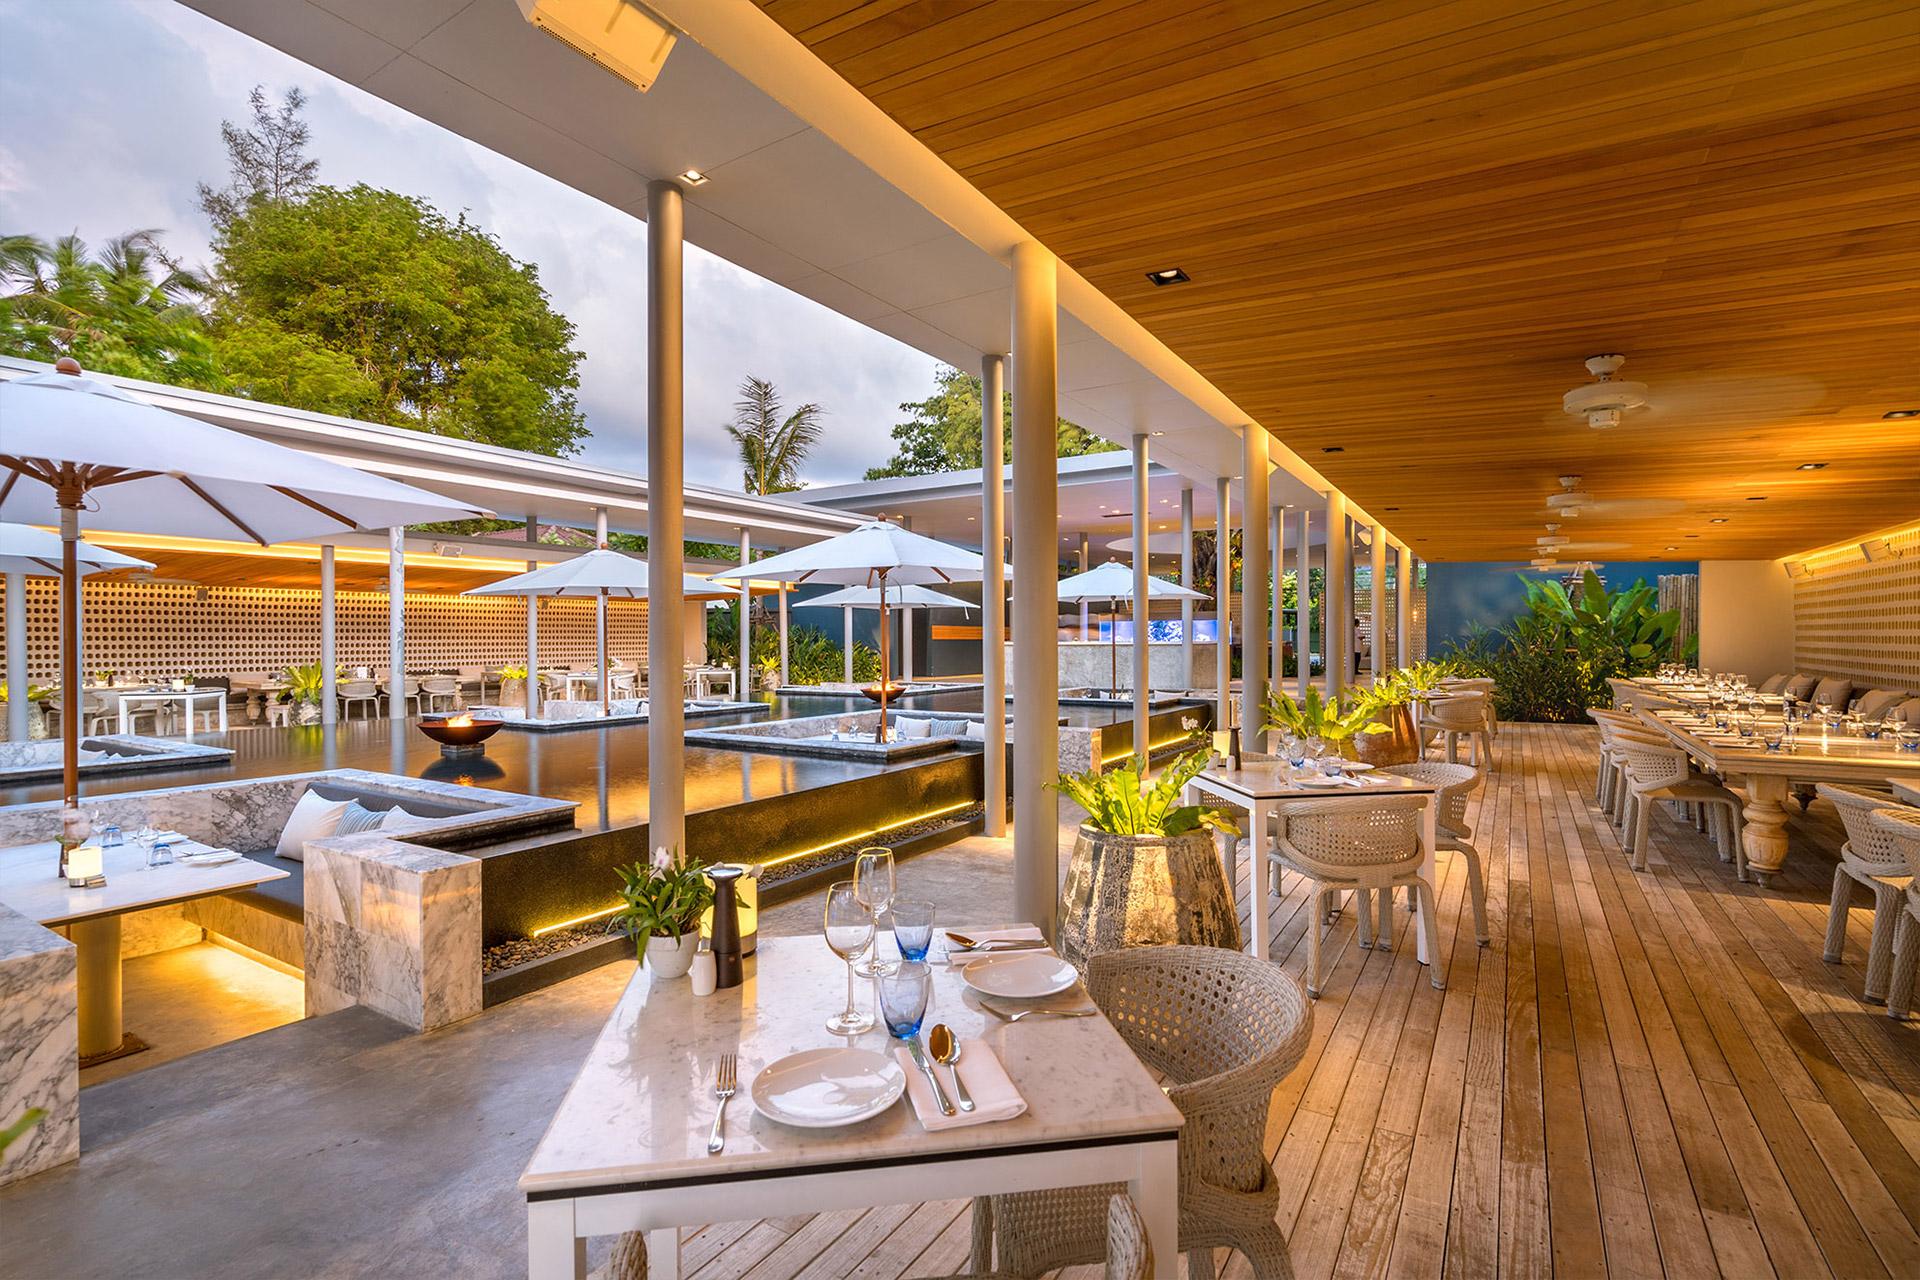 Palm Seaside Restaurant, Lounge & Bar